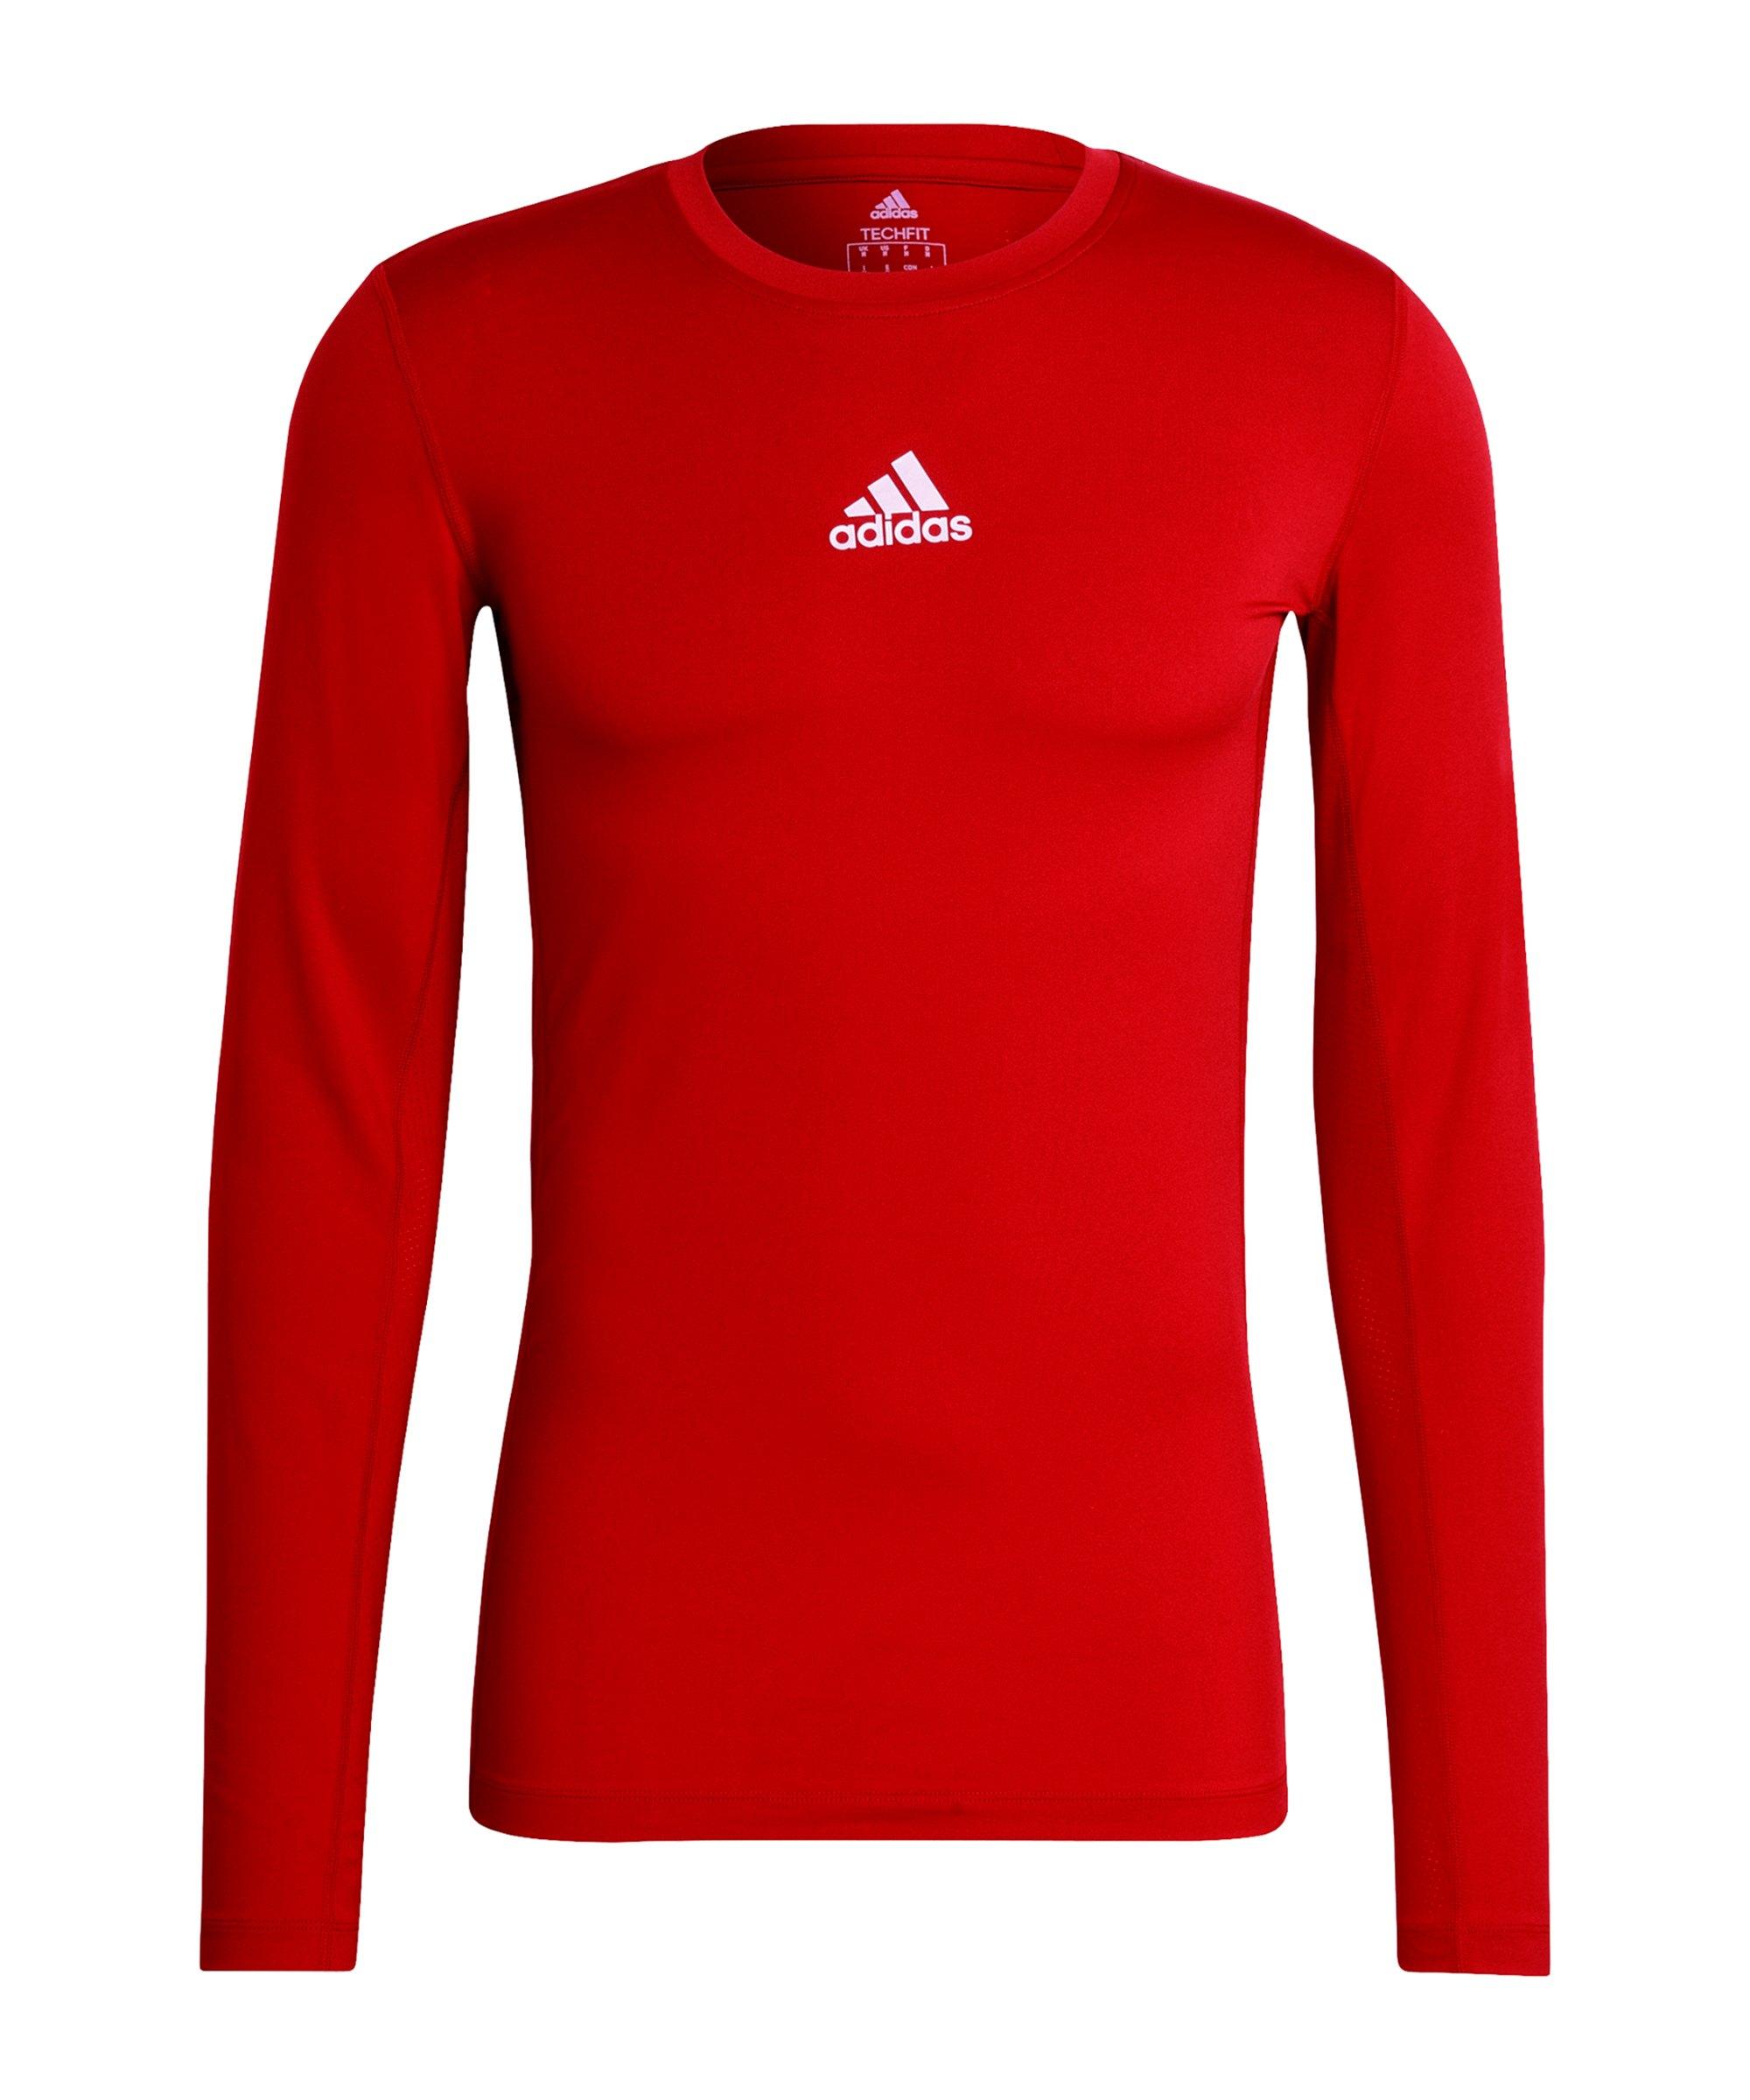 adidas Techfit Shirt langarm Rot - rot